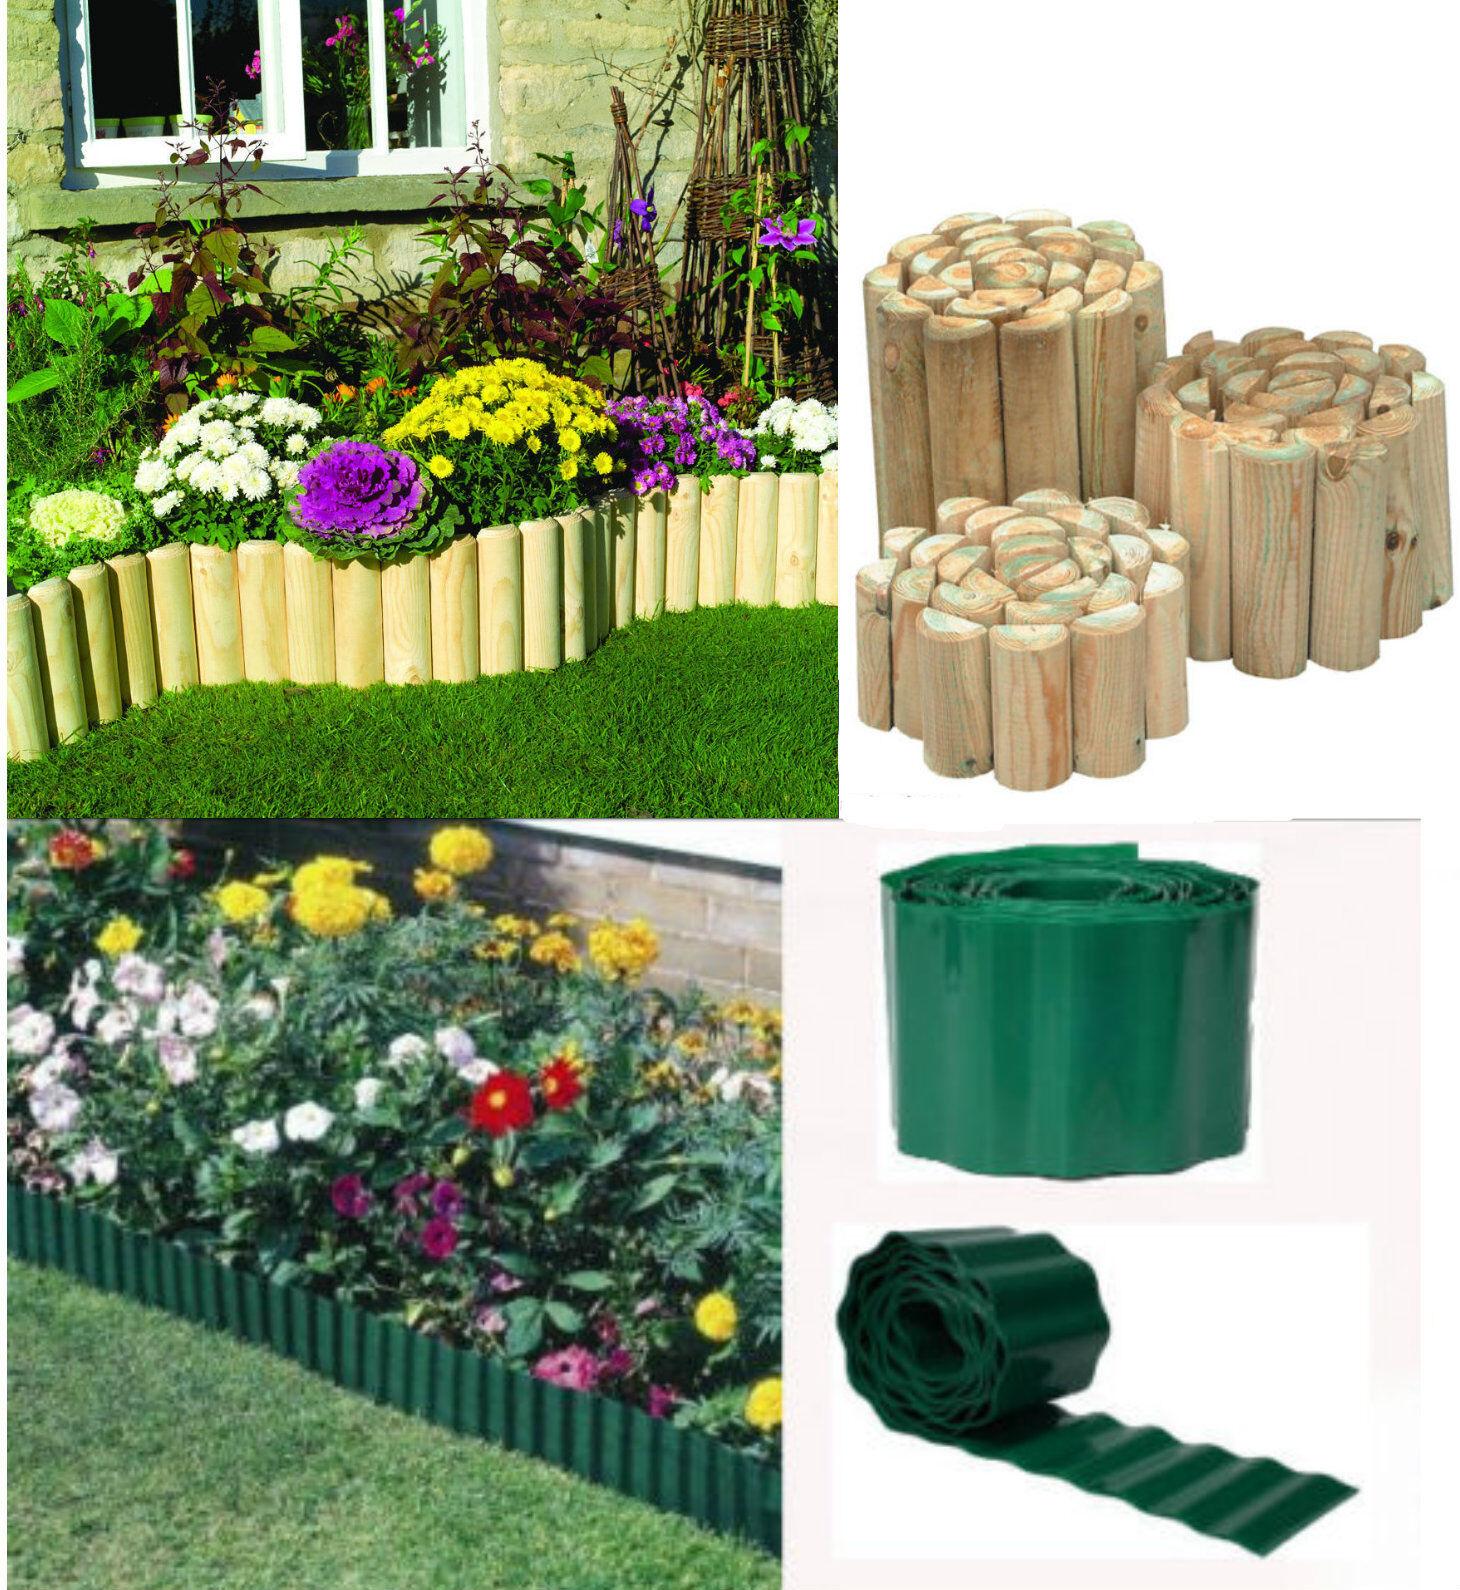 Green Plastic Garden Grass Lawn Edge Edging Border Fence